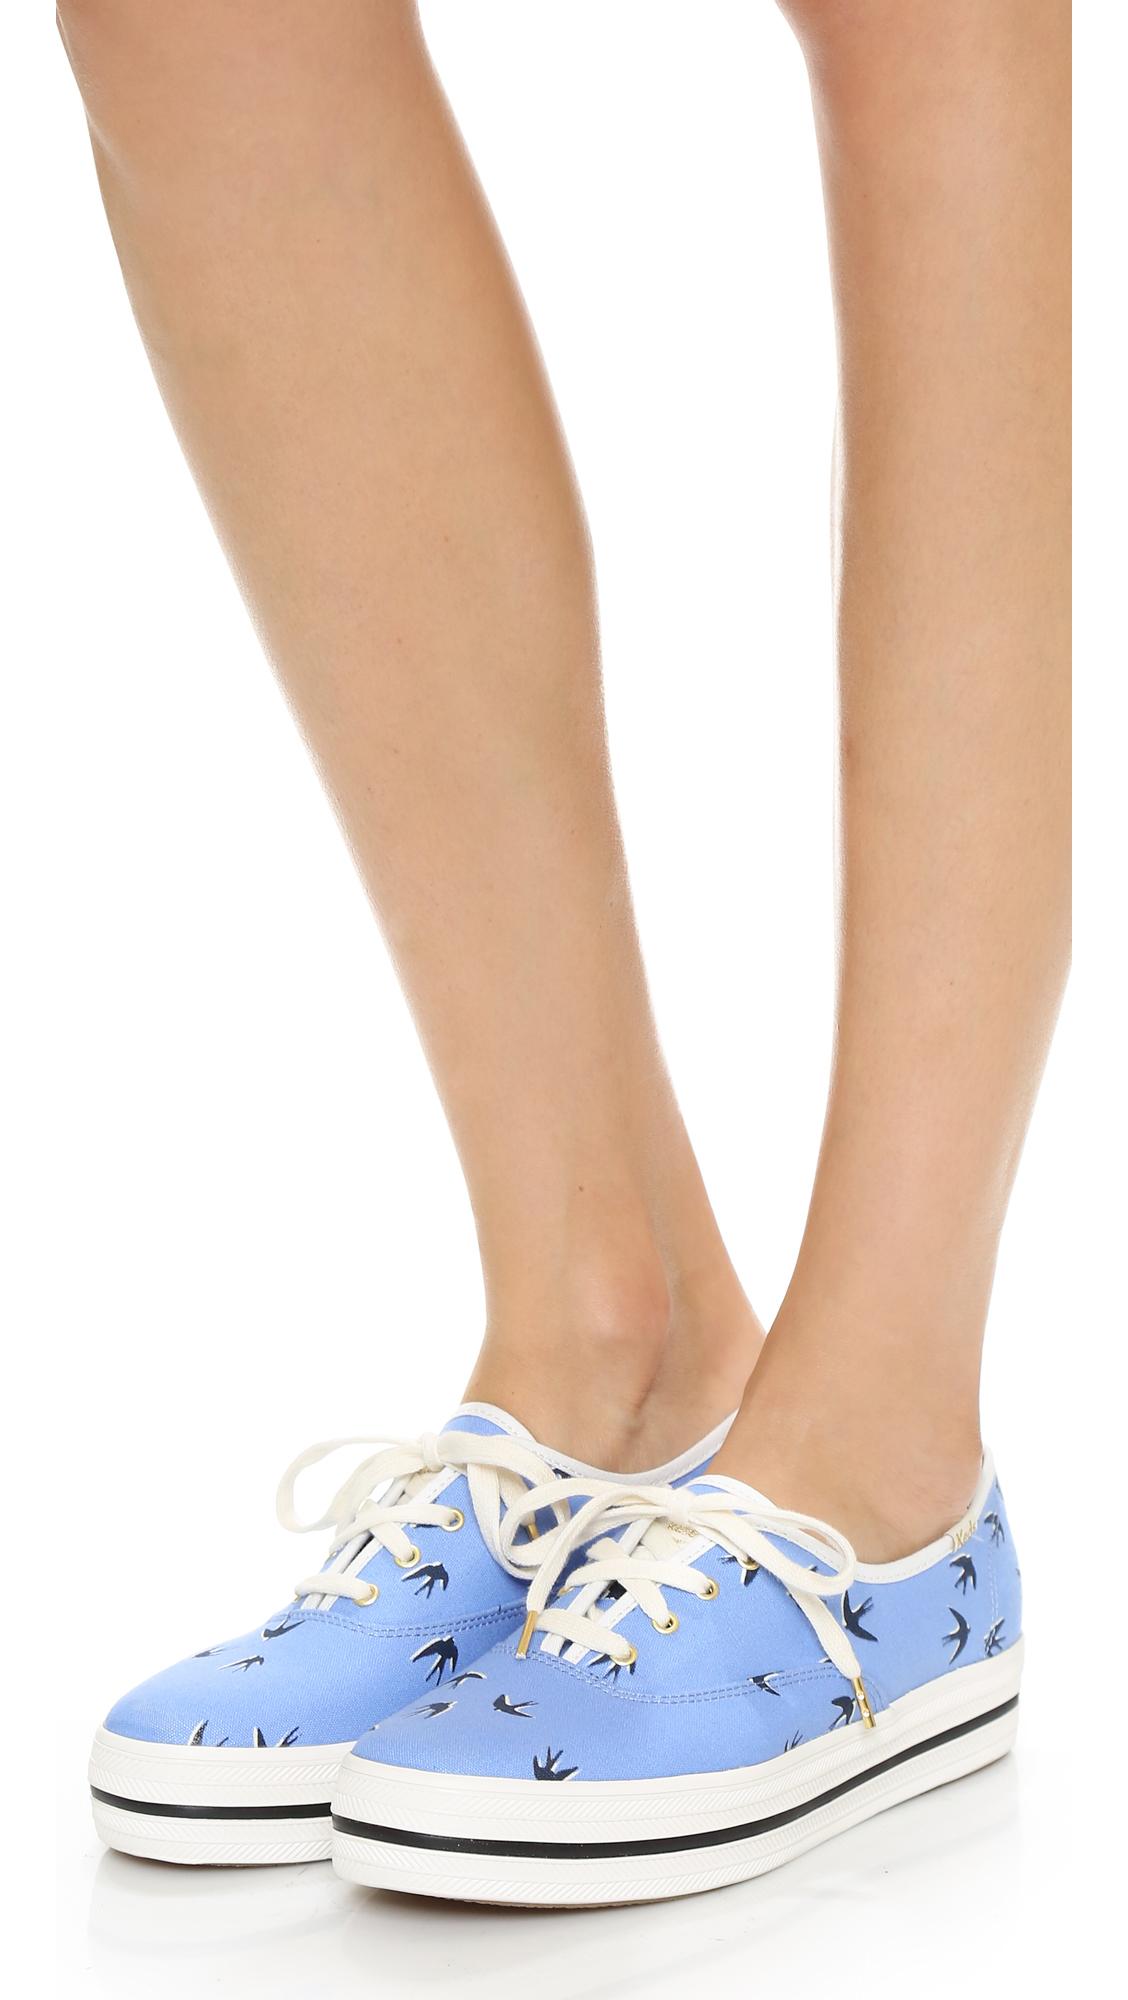 d0be5ea41c11d Lyst - Kate Spade Keds For Kate Spade Triple Kick Swallow Sneakers ...